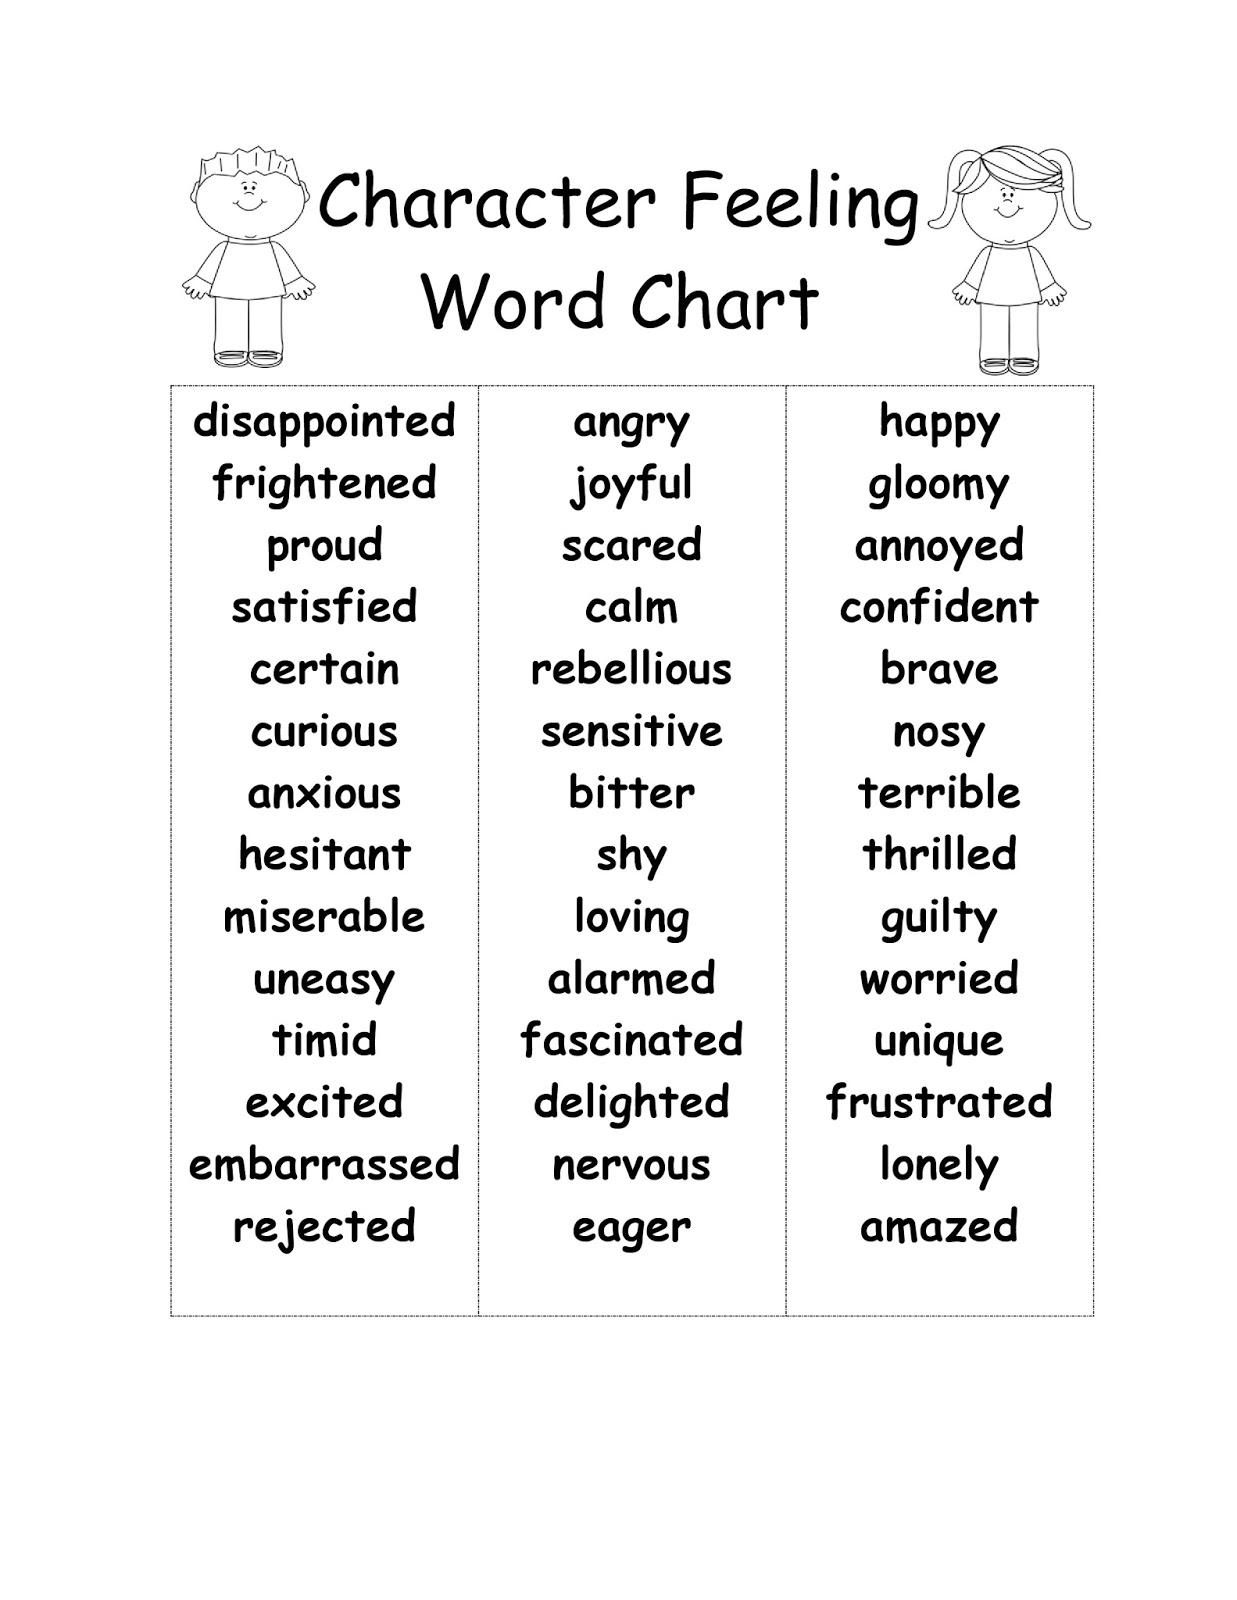 Updated Character Feelings Word Chart